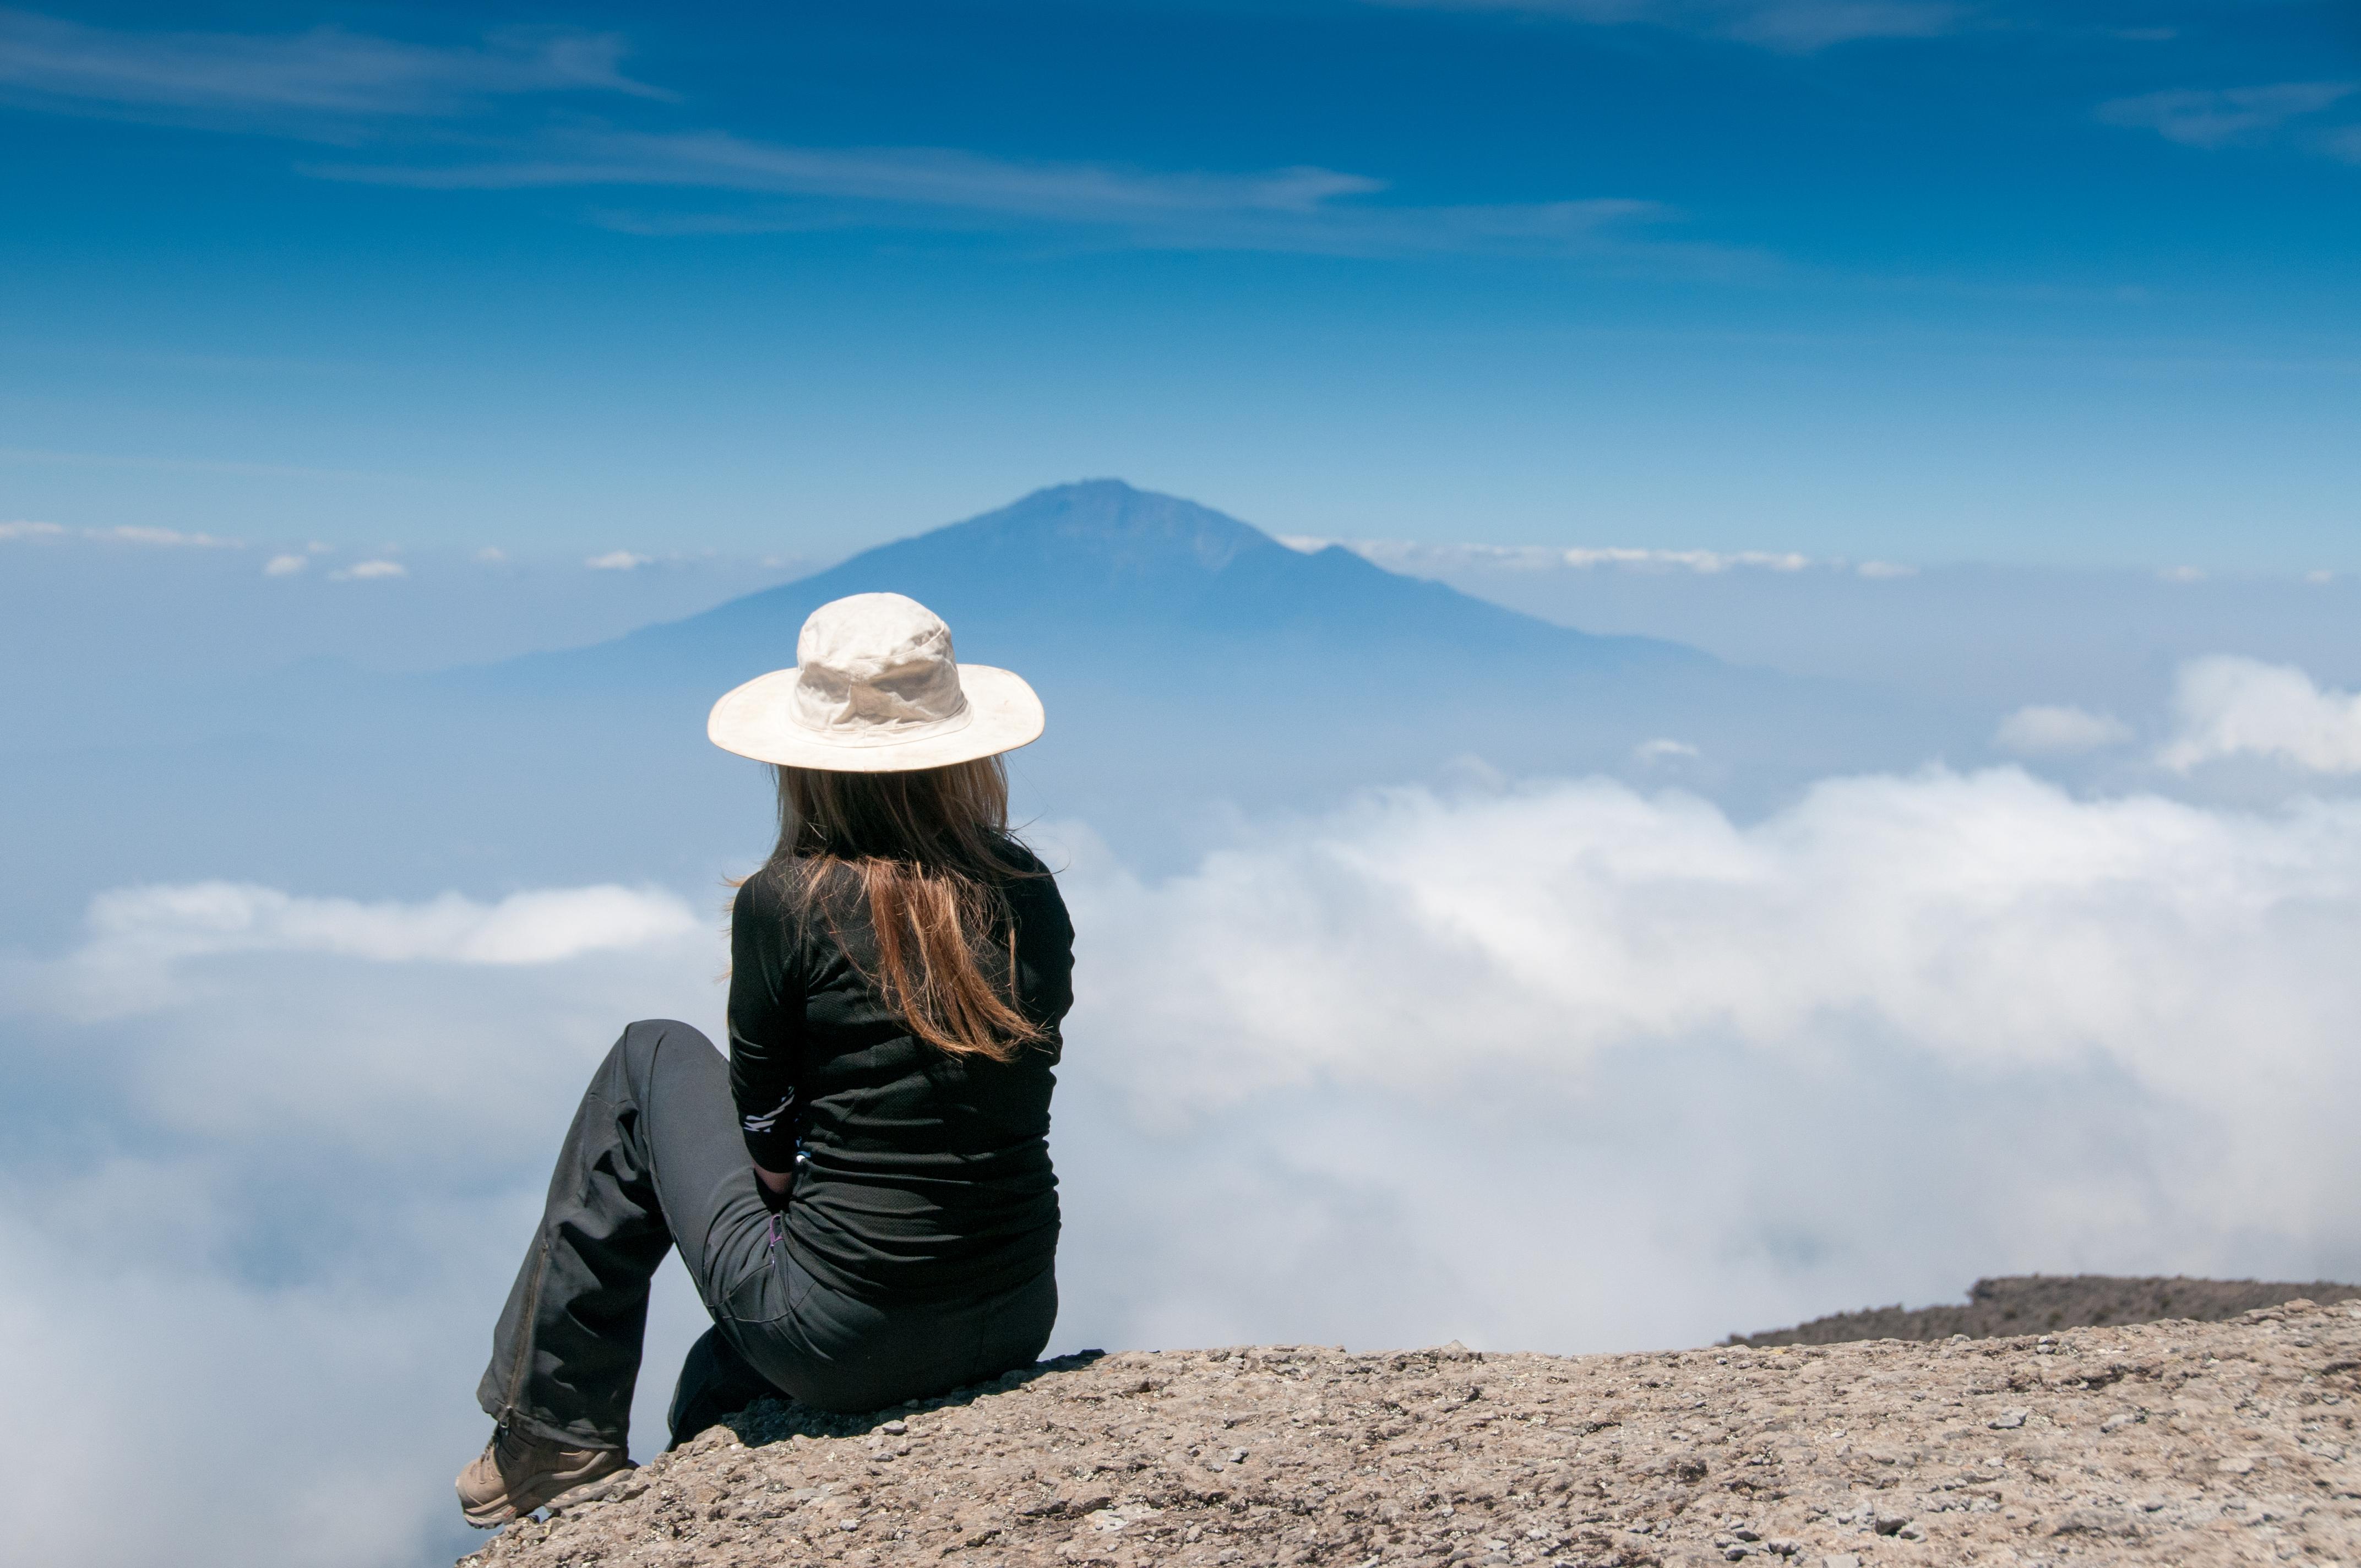 Kilimanjaro te cambia la vida - Tanzania Gran Viaje Ascensión al Kilimanjaro: Ruta Marangu